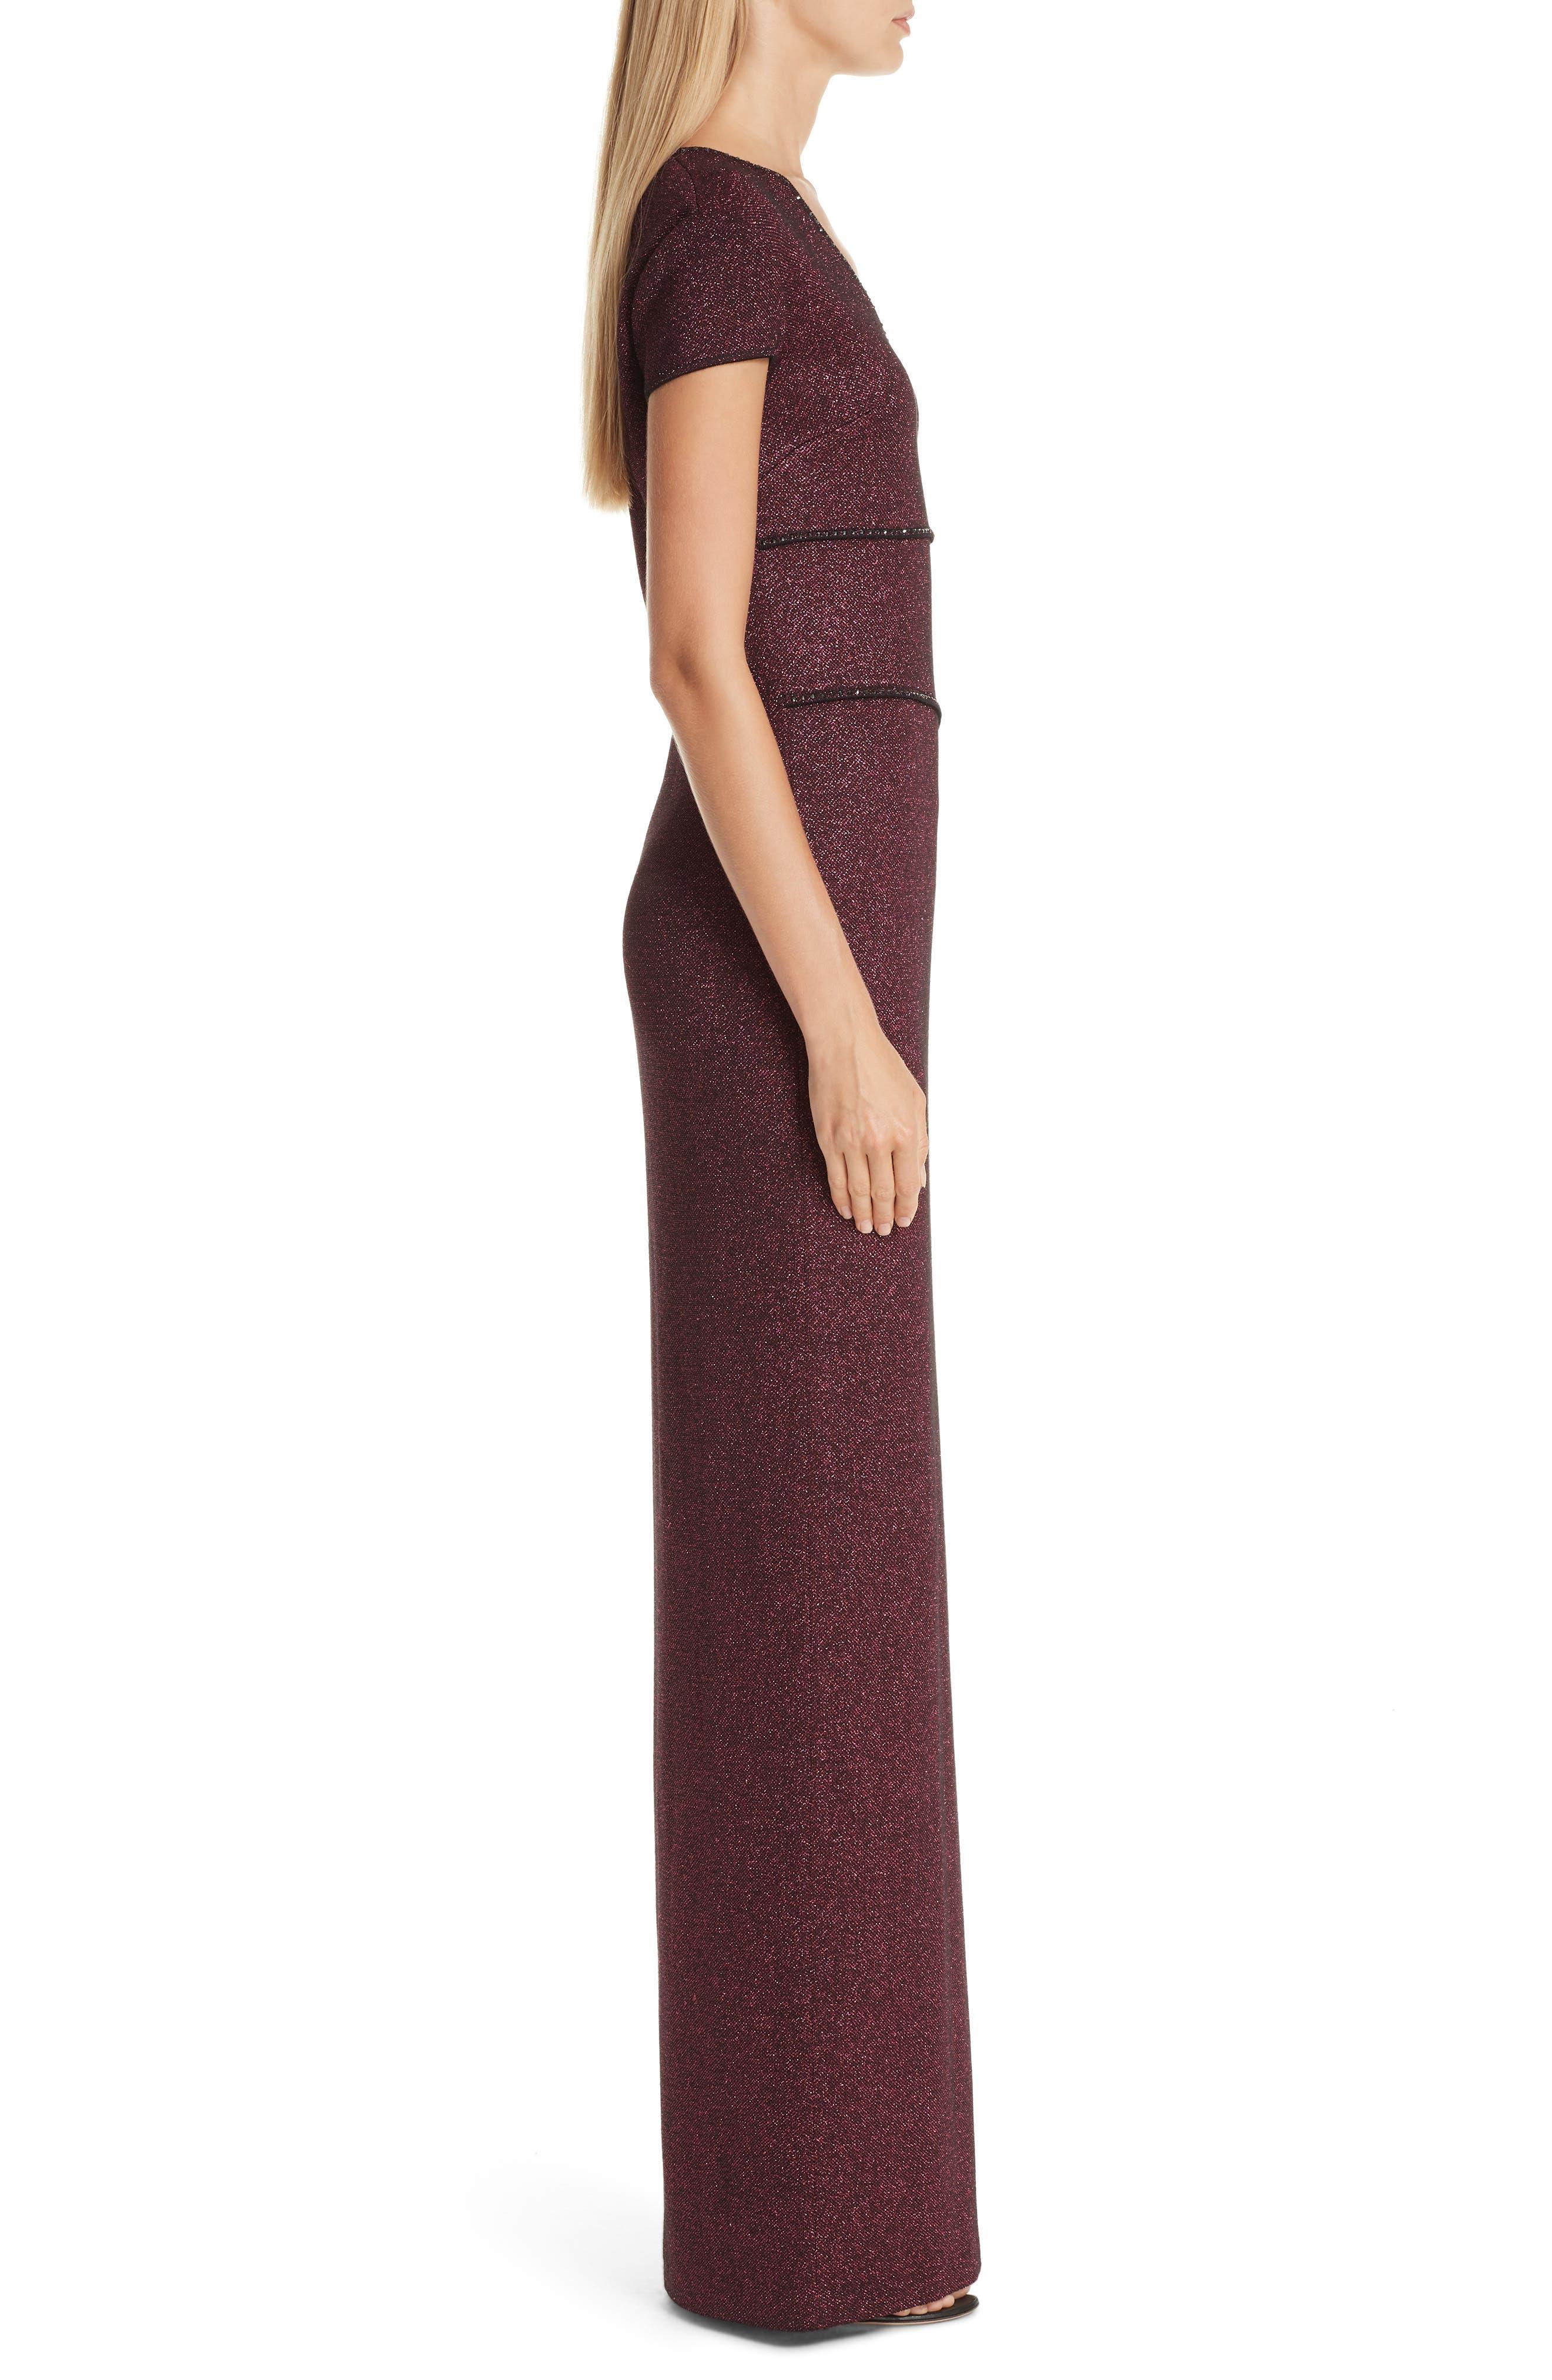 ST. JOHN COLLECTION, Mod Metallic Knit Gown, Alternate thumbnail 3, color, DARK PINK MULTI